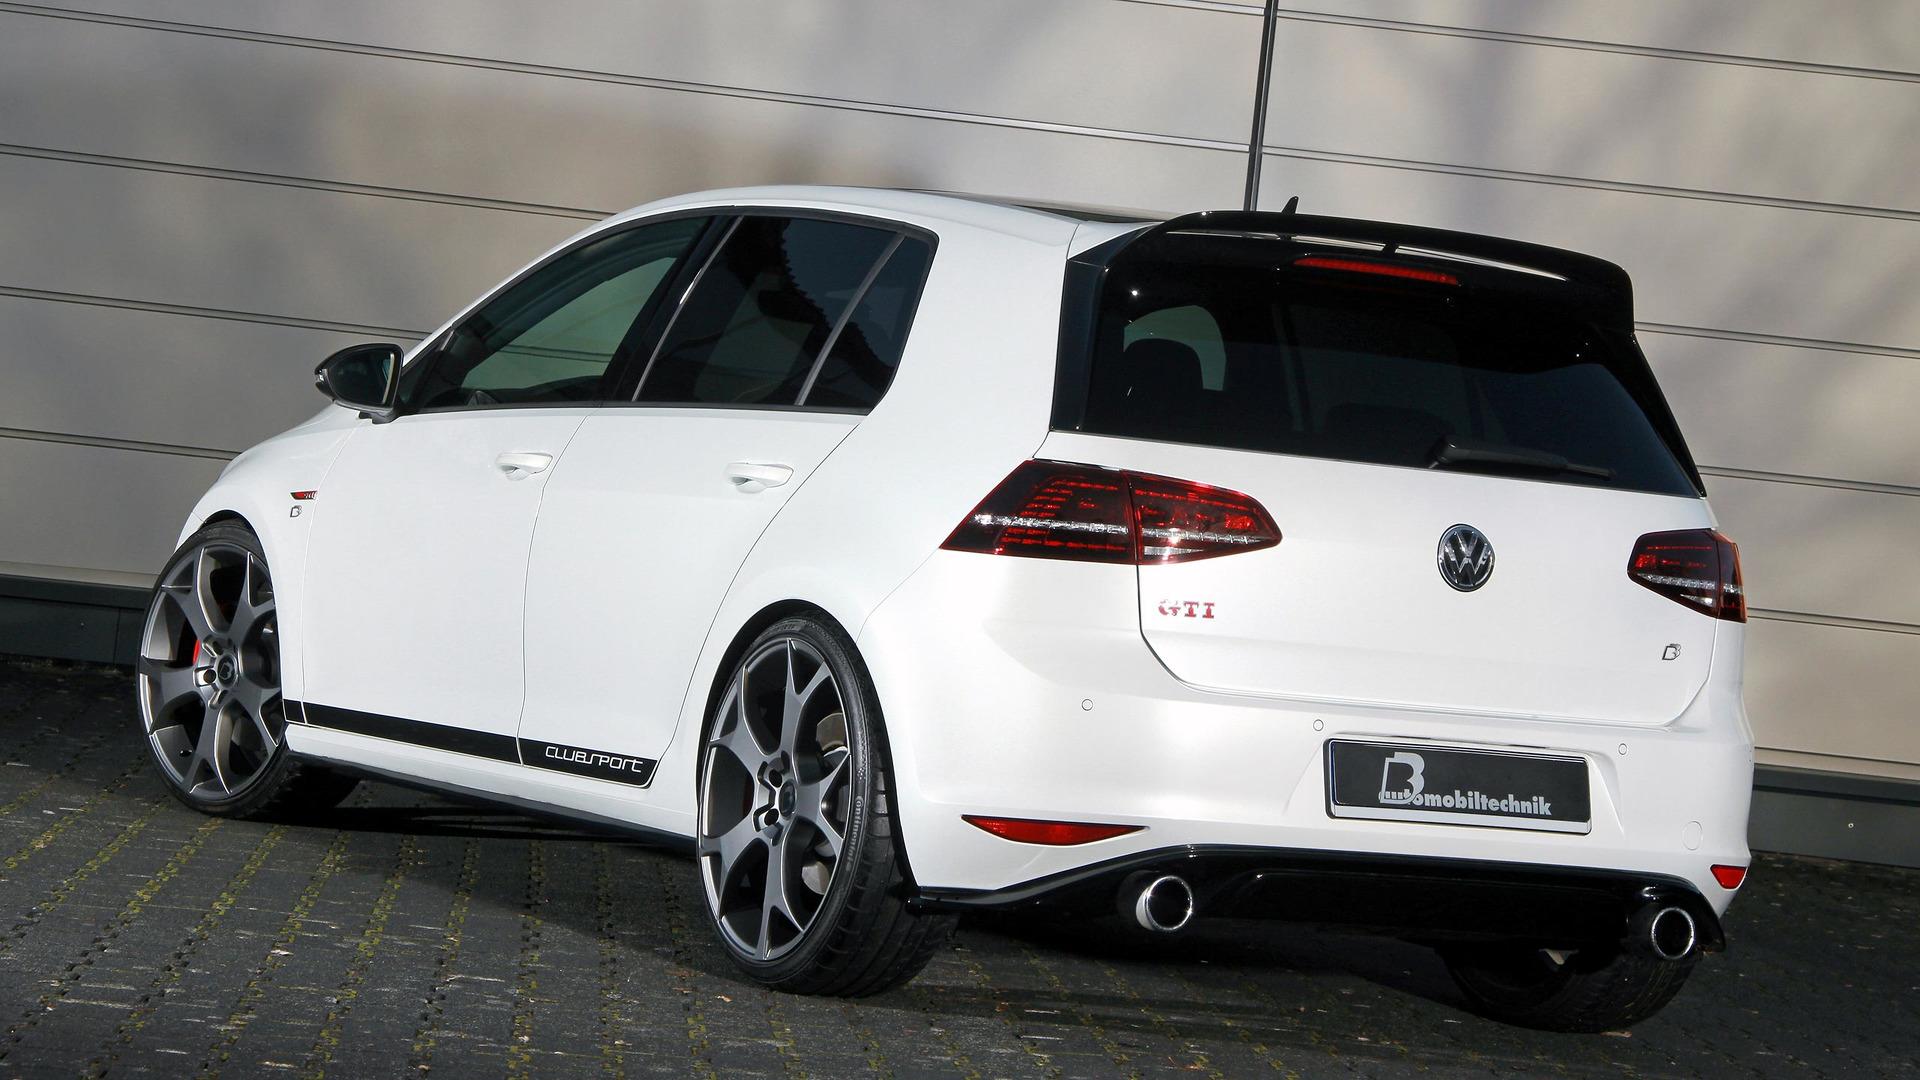 vw-golf-gti-clubsport-s-by-bb-automobiltechnik-3